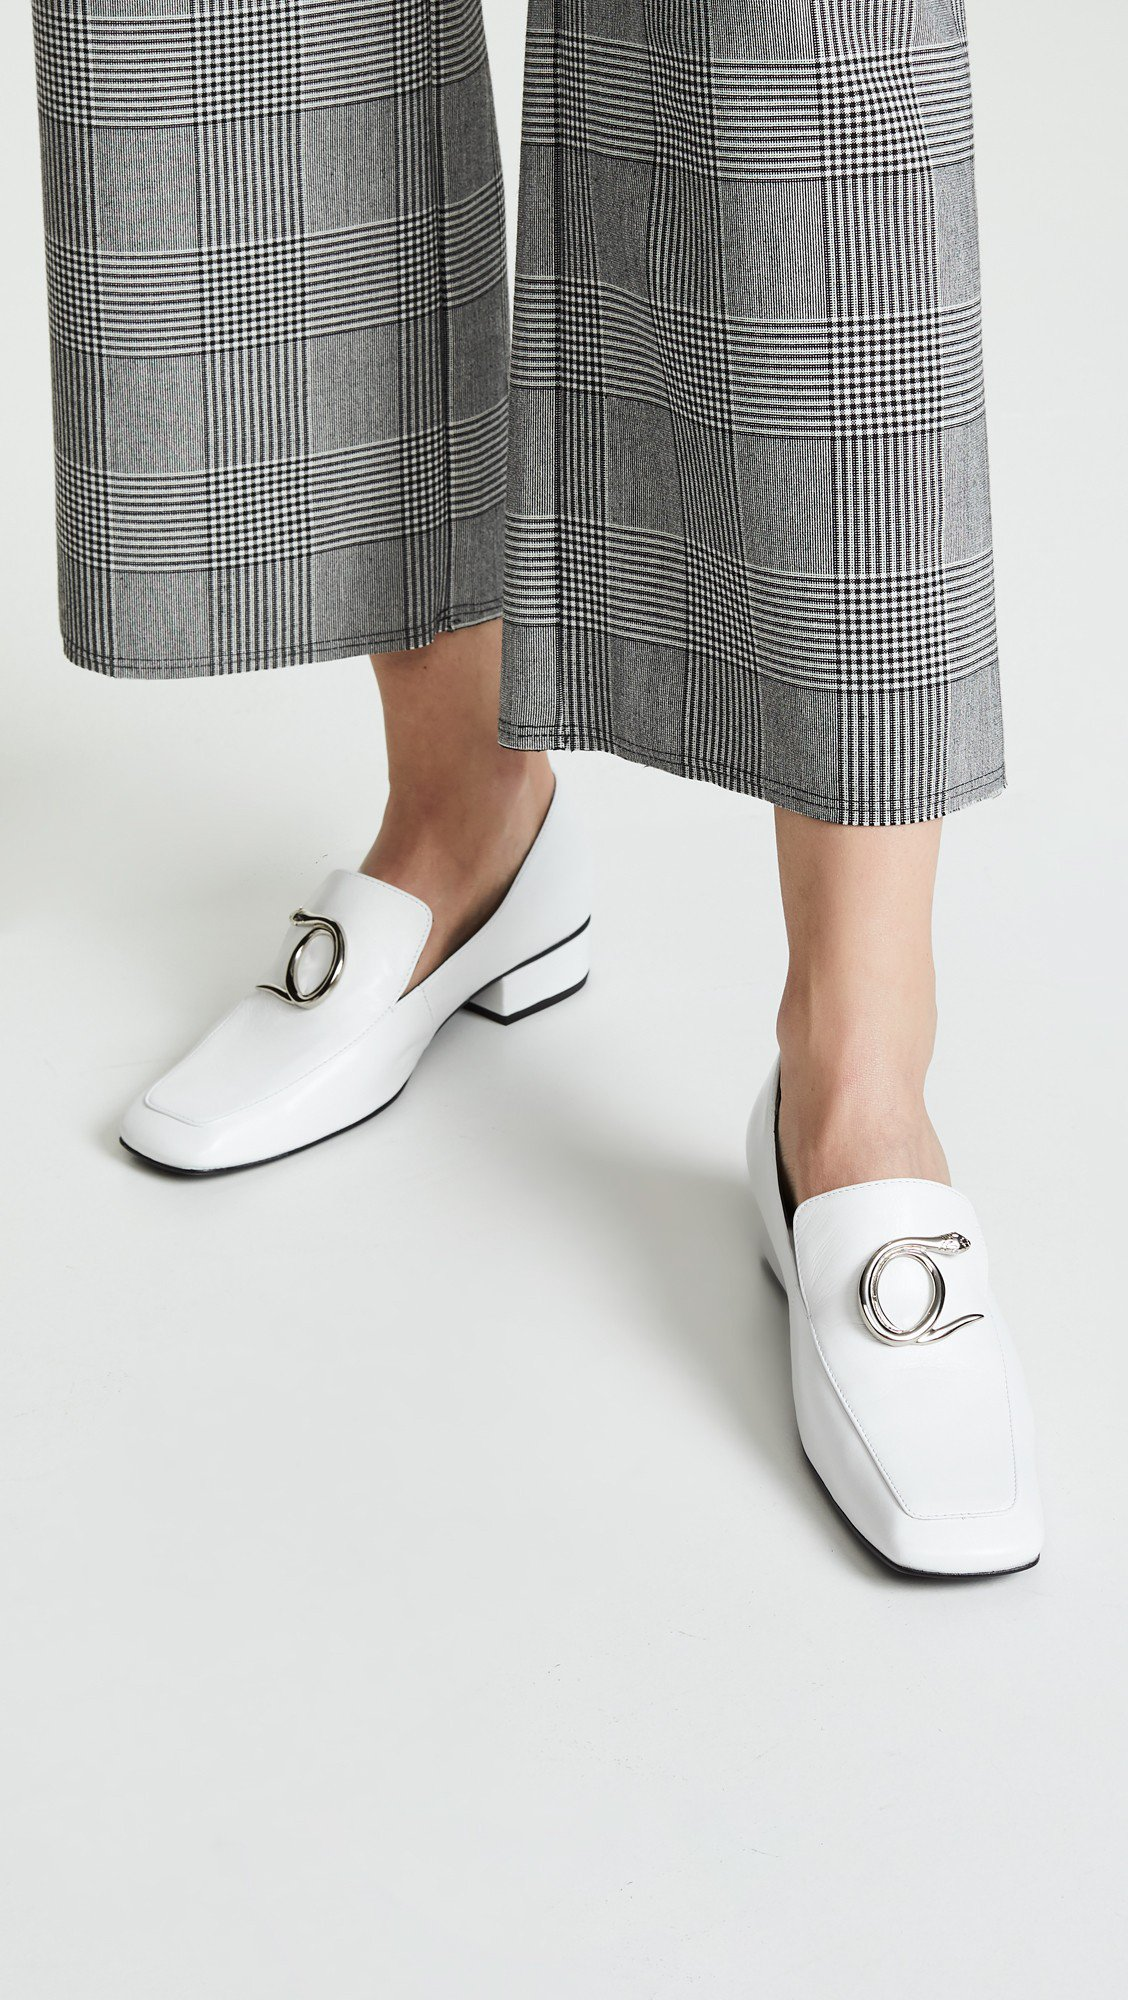 Dorateymur Han Serpent淺口船鞋,售價475美元、約合台幣1...